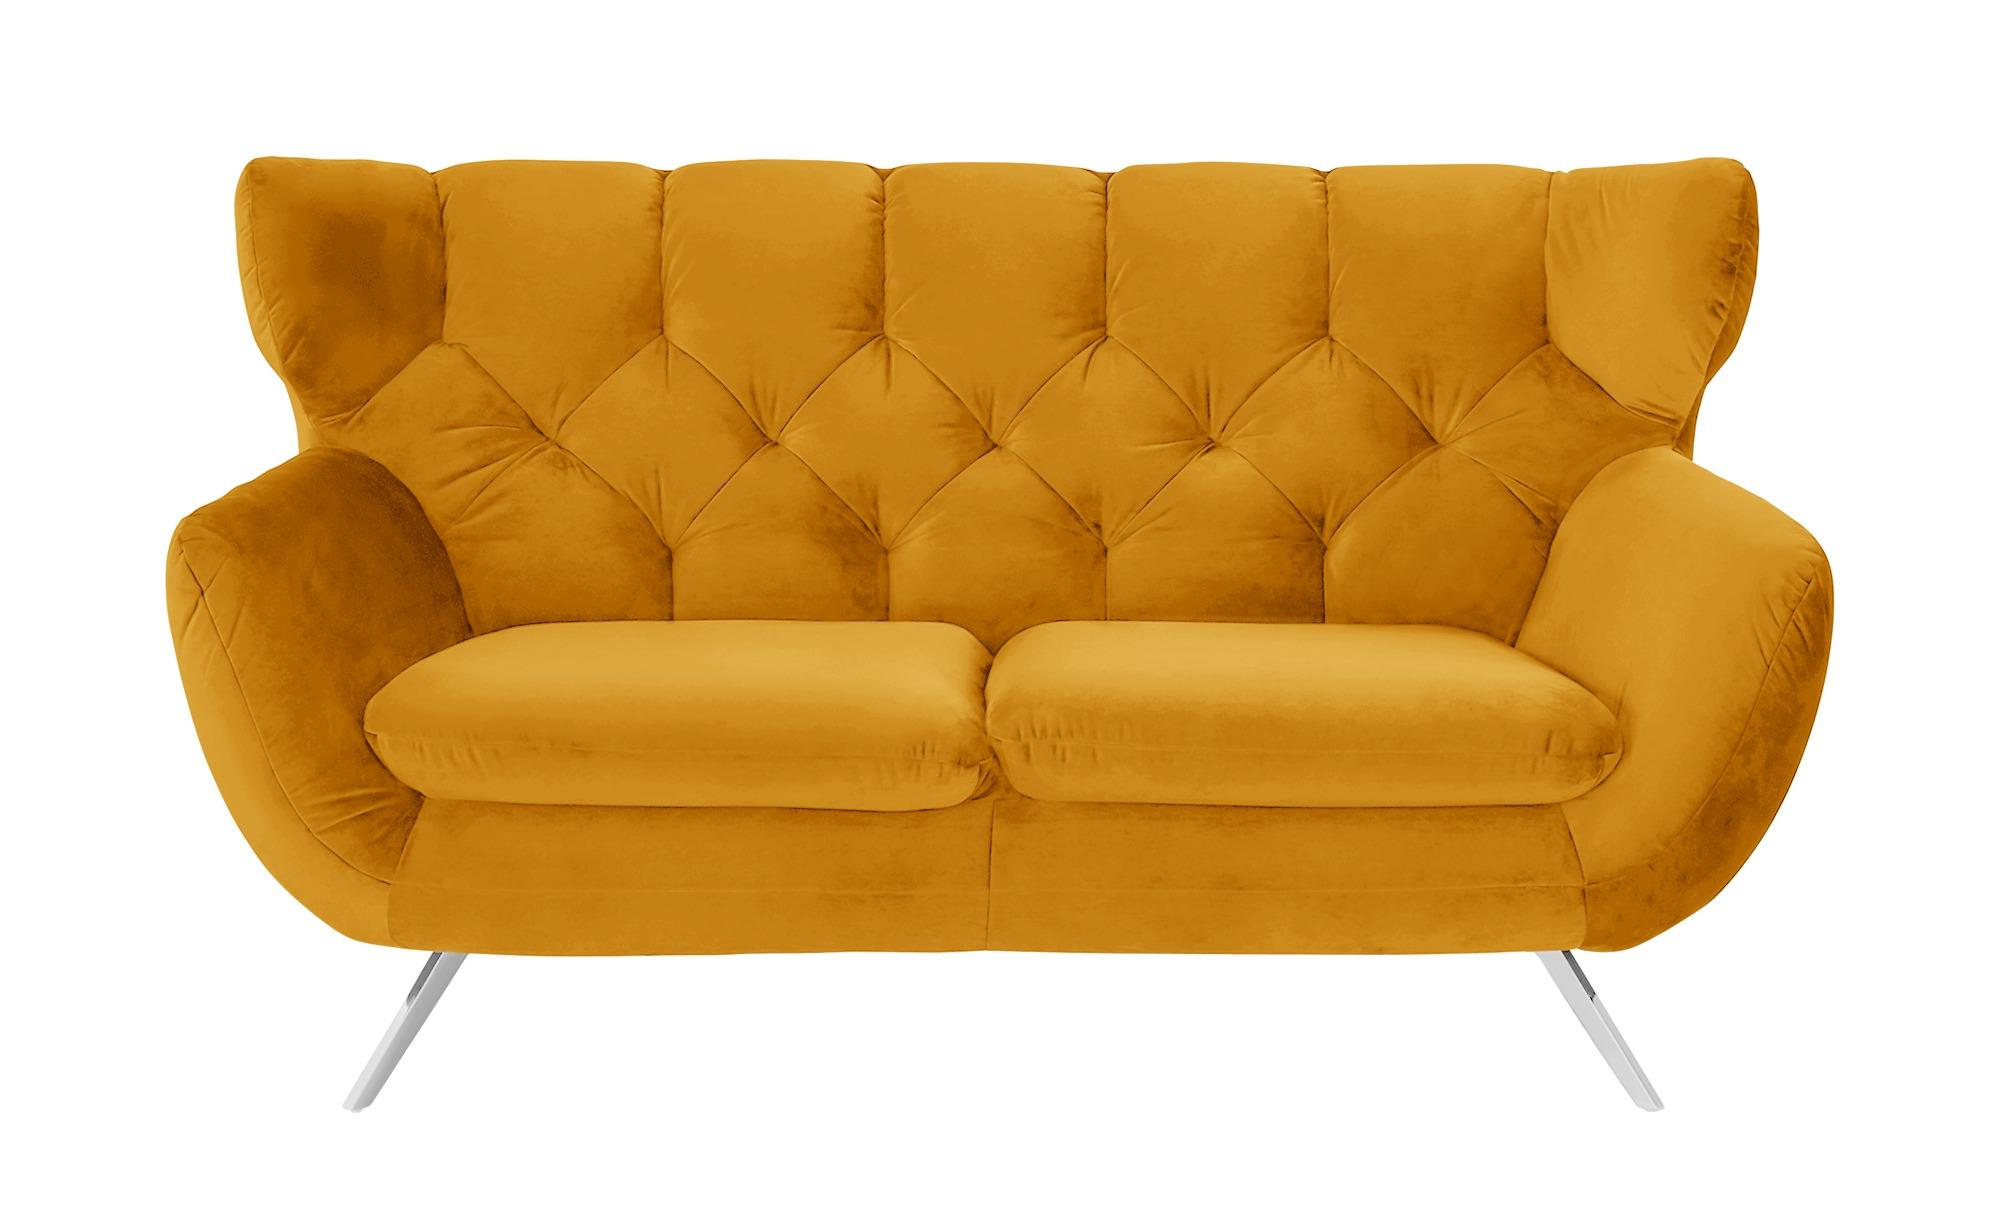 pop Sofa  Caldara ¦ gelb ¦ Maße (cm): B: 175 H: 94 T: 95 Polstermöbel > Sofas > 2-Sitzer - Höffner